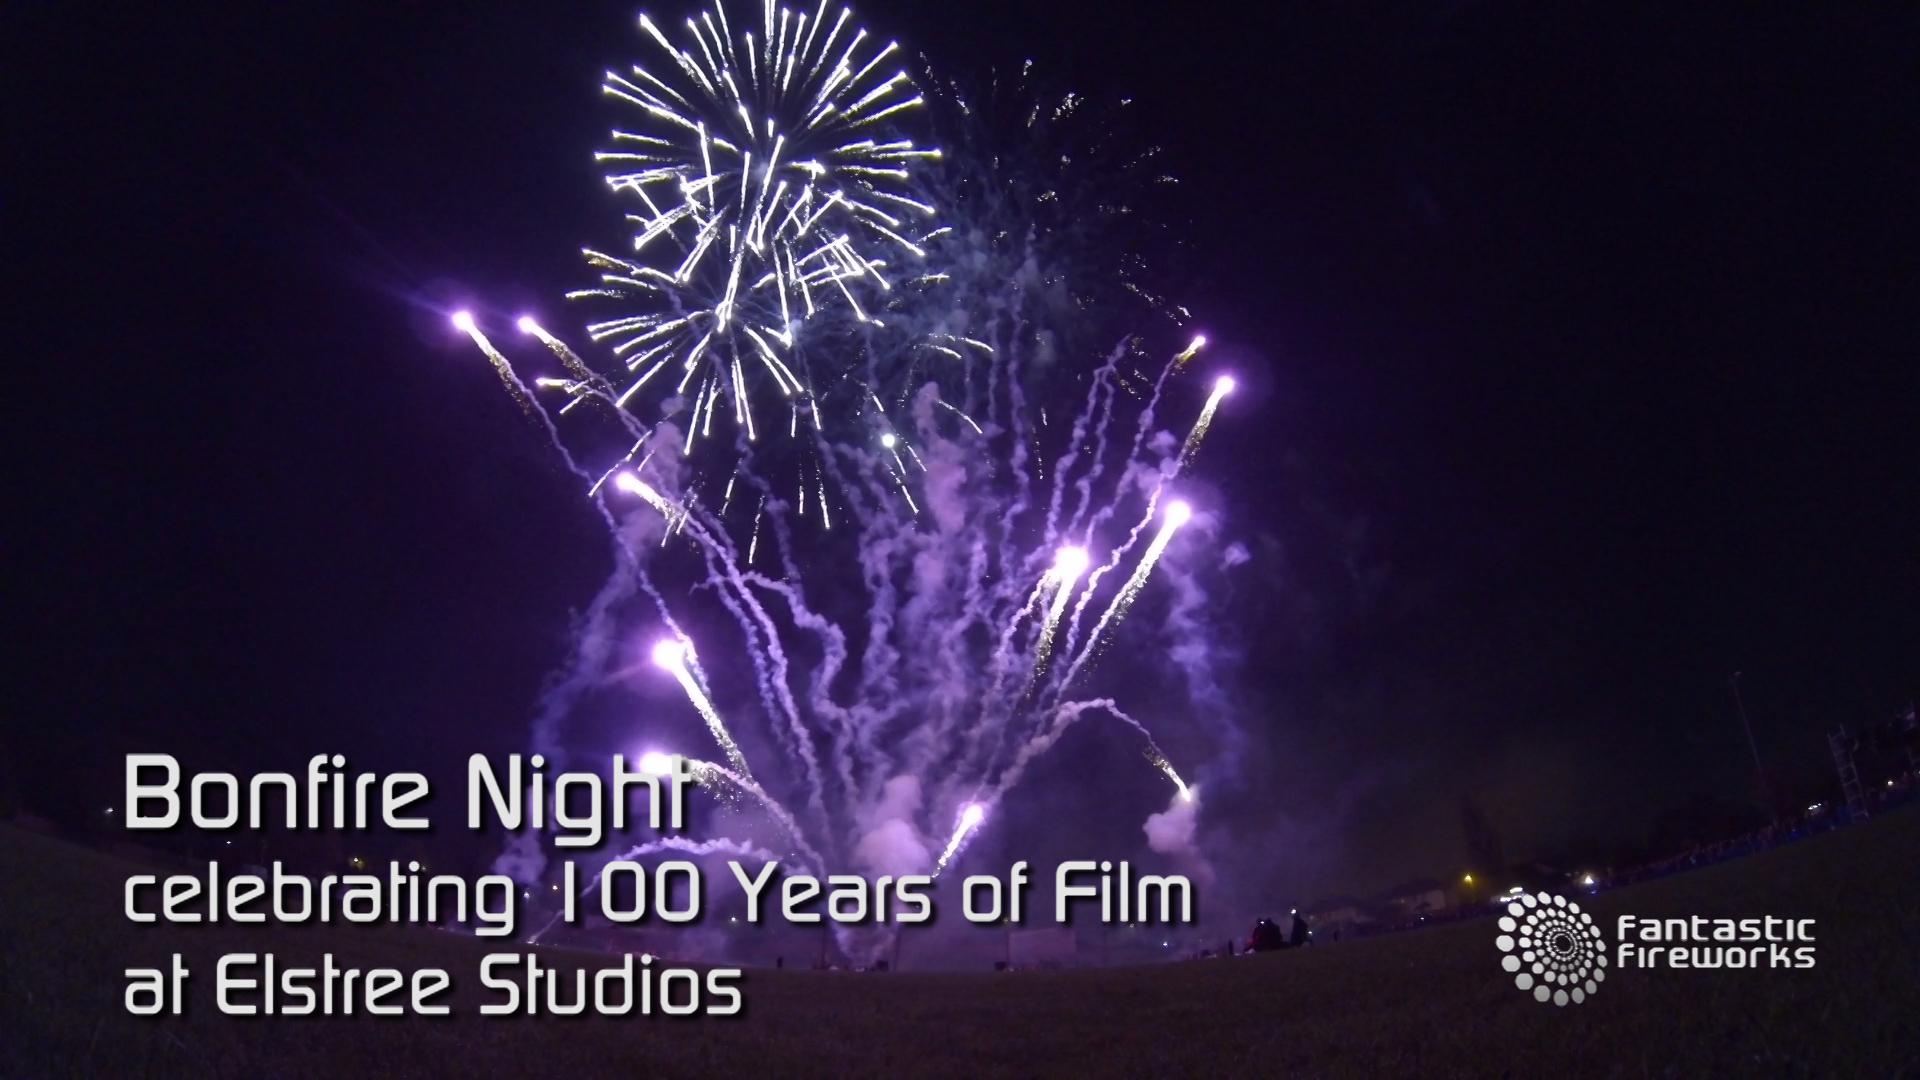 Professional Fireworks Displays | Elstree Bonfire Night